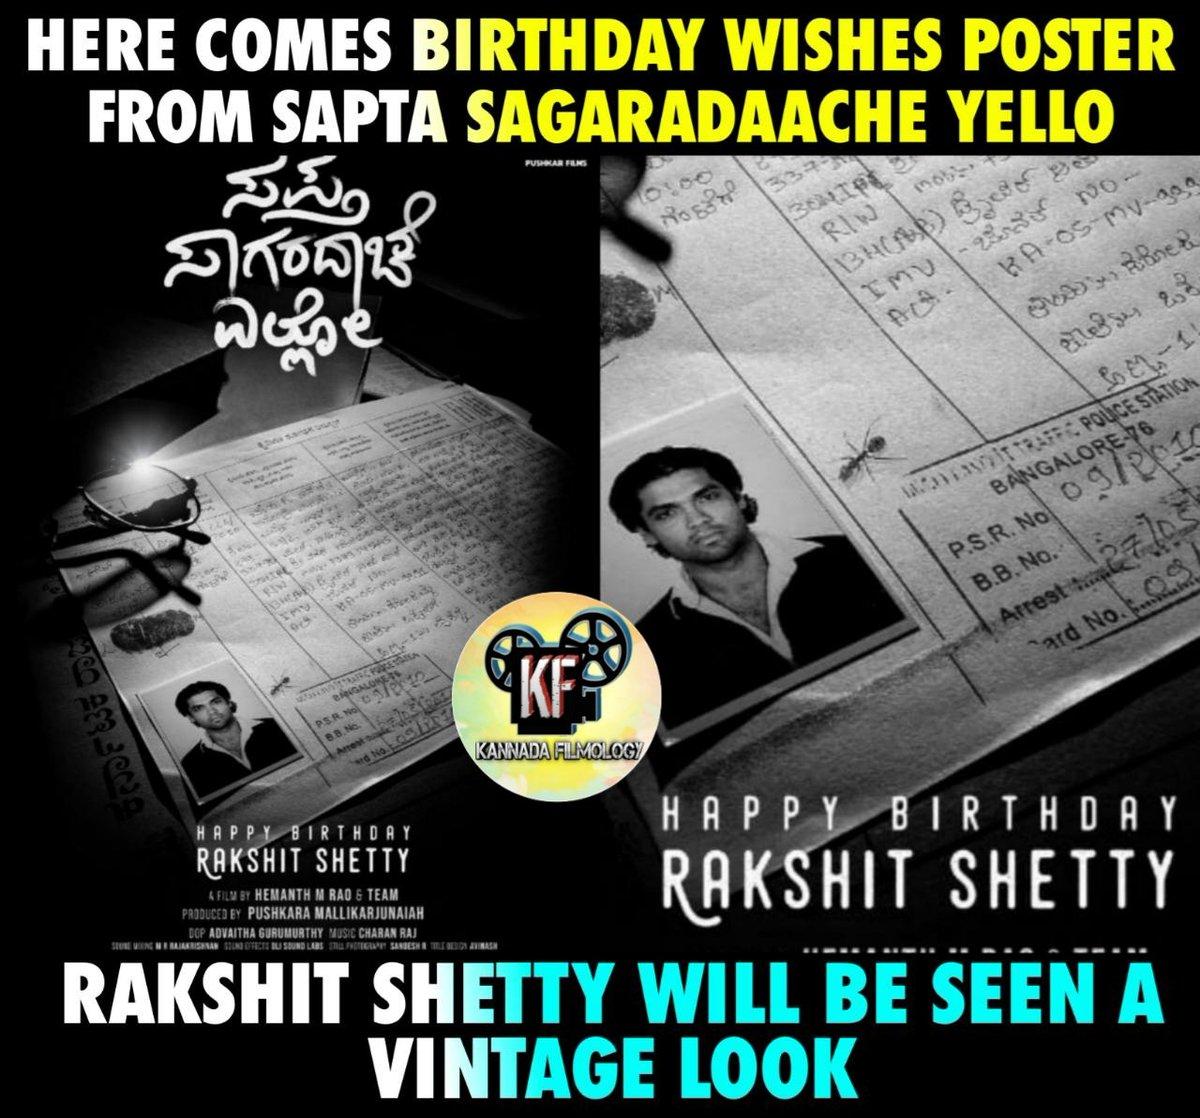 Saptha Sagaradache Yello First New Poster Out Now 🔥  @rakshitshetty @Pushkara_M @hemanthrao11  #SapthaSagaradacheYello #SSAY #RakshitShetty #KannadaFilmology https://t.co/IgksSXhYUP